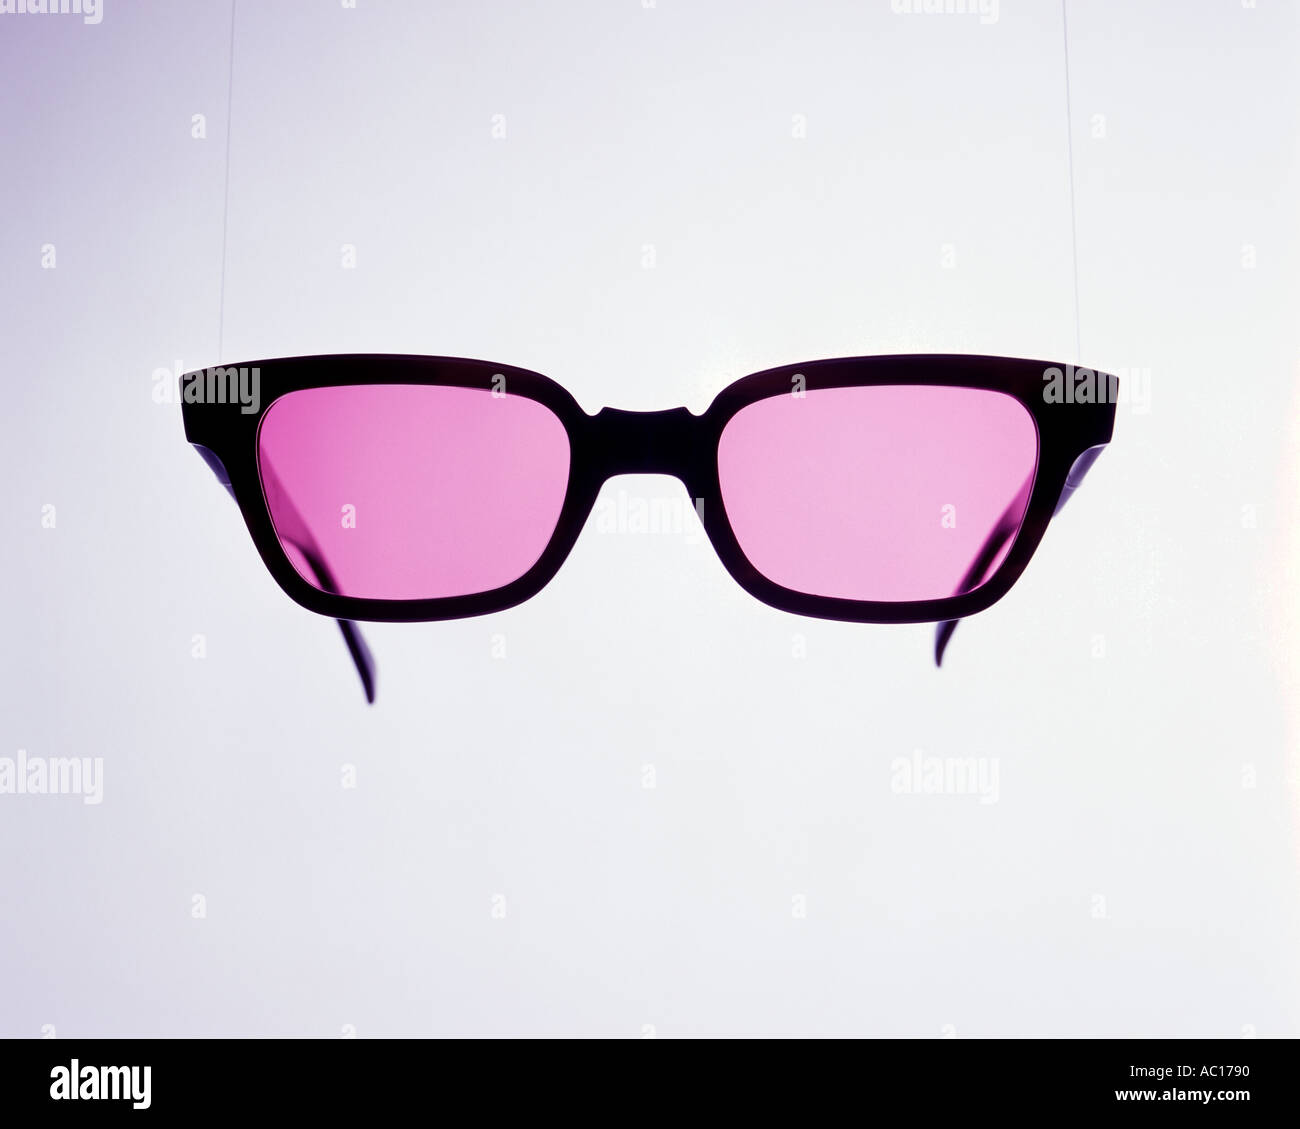 Pink Sunglasses - Stock Image